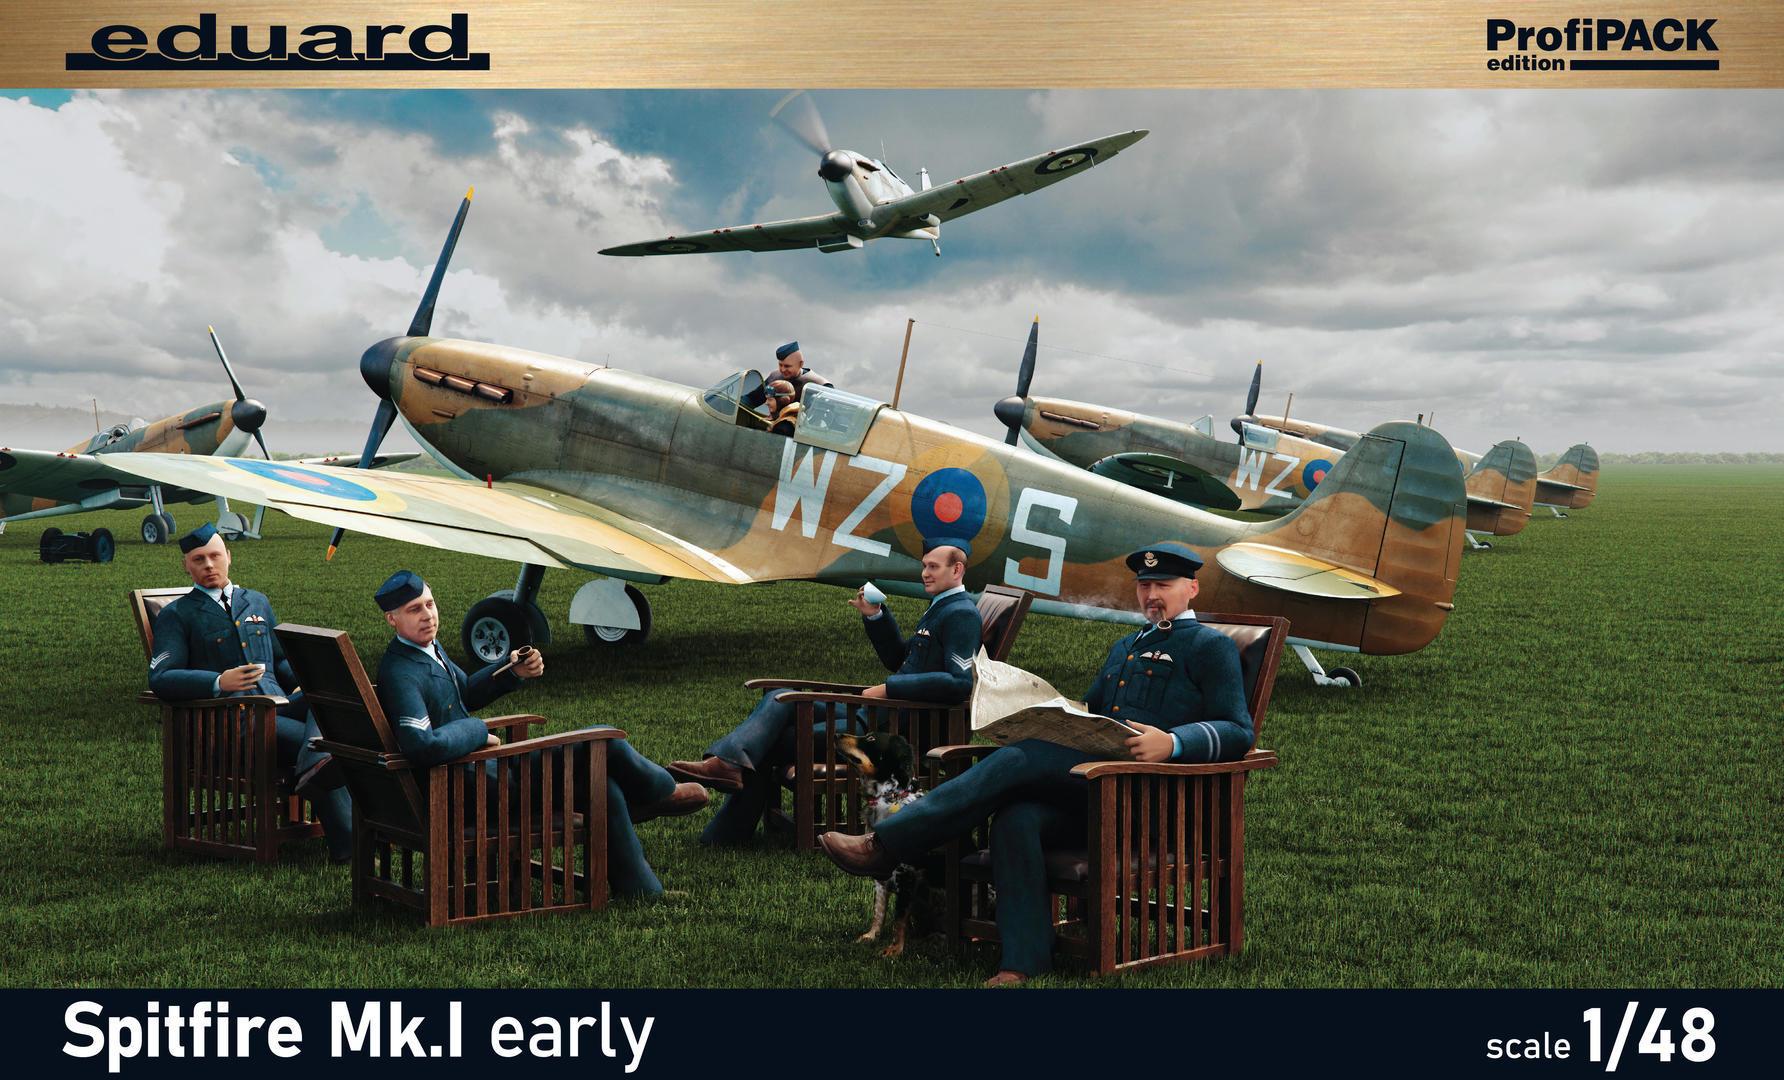 Eduard 1/48 Spitfire Mk.I early [Profipack]